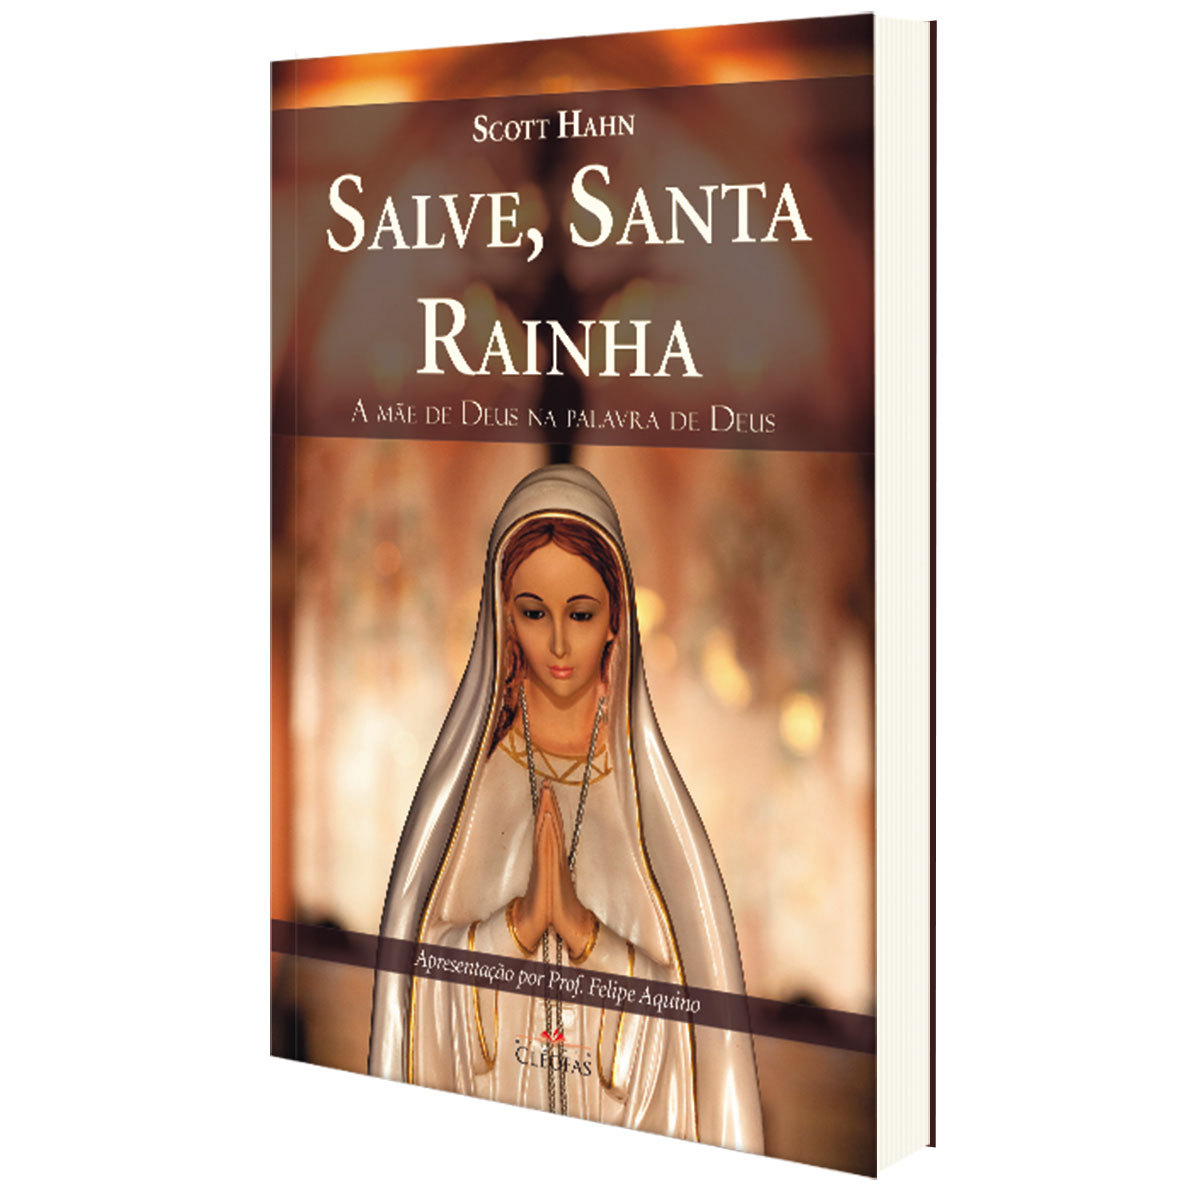 Livro Salve, Santa Rainha - Scott e Kimberly Hahn